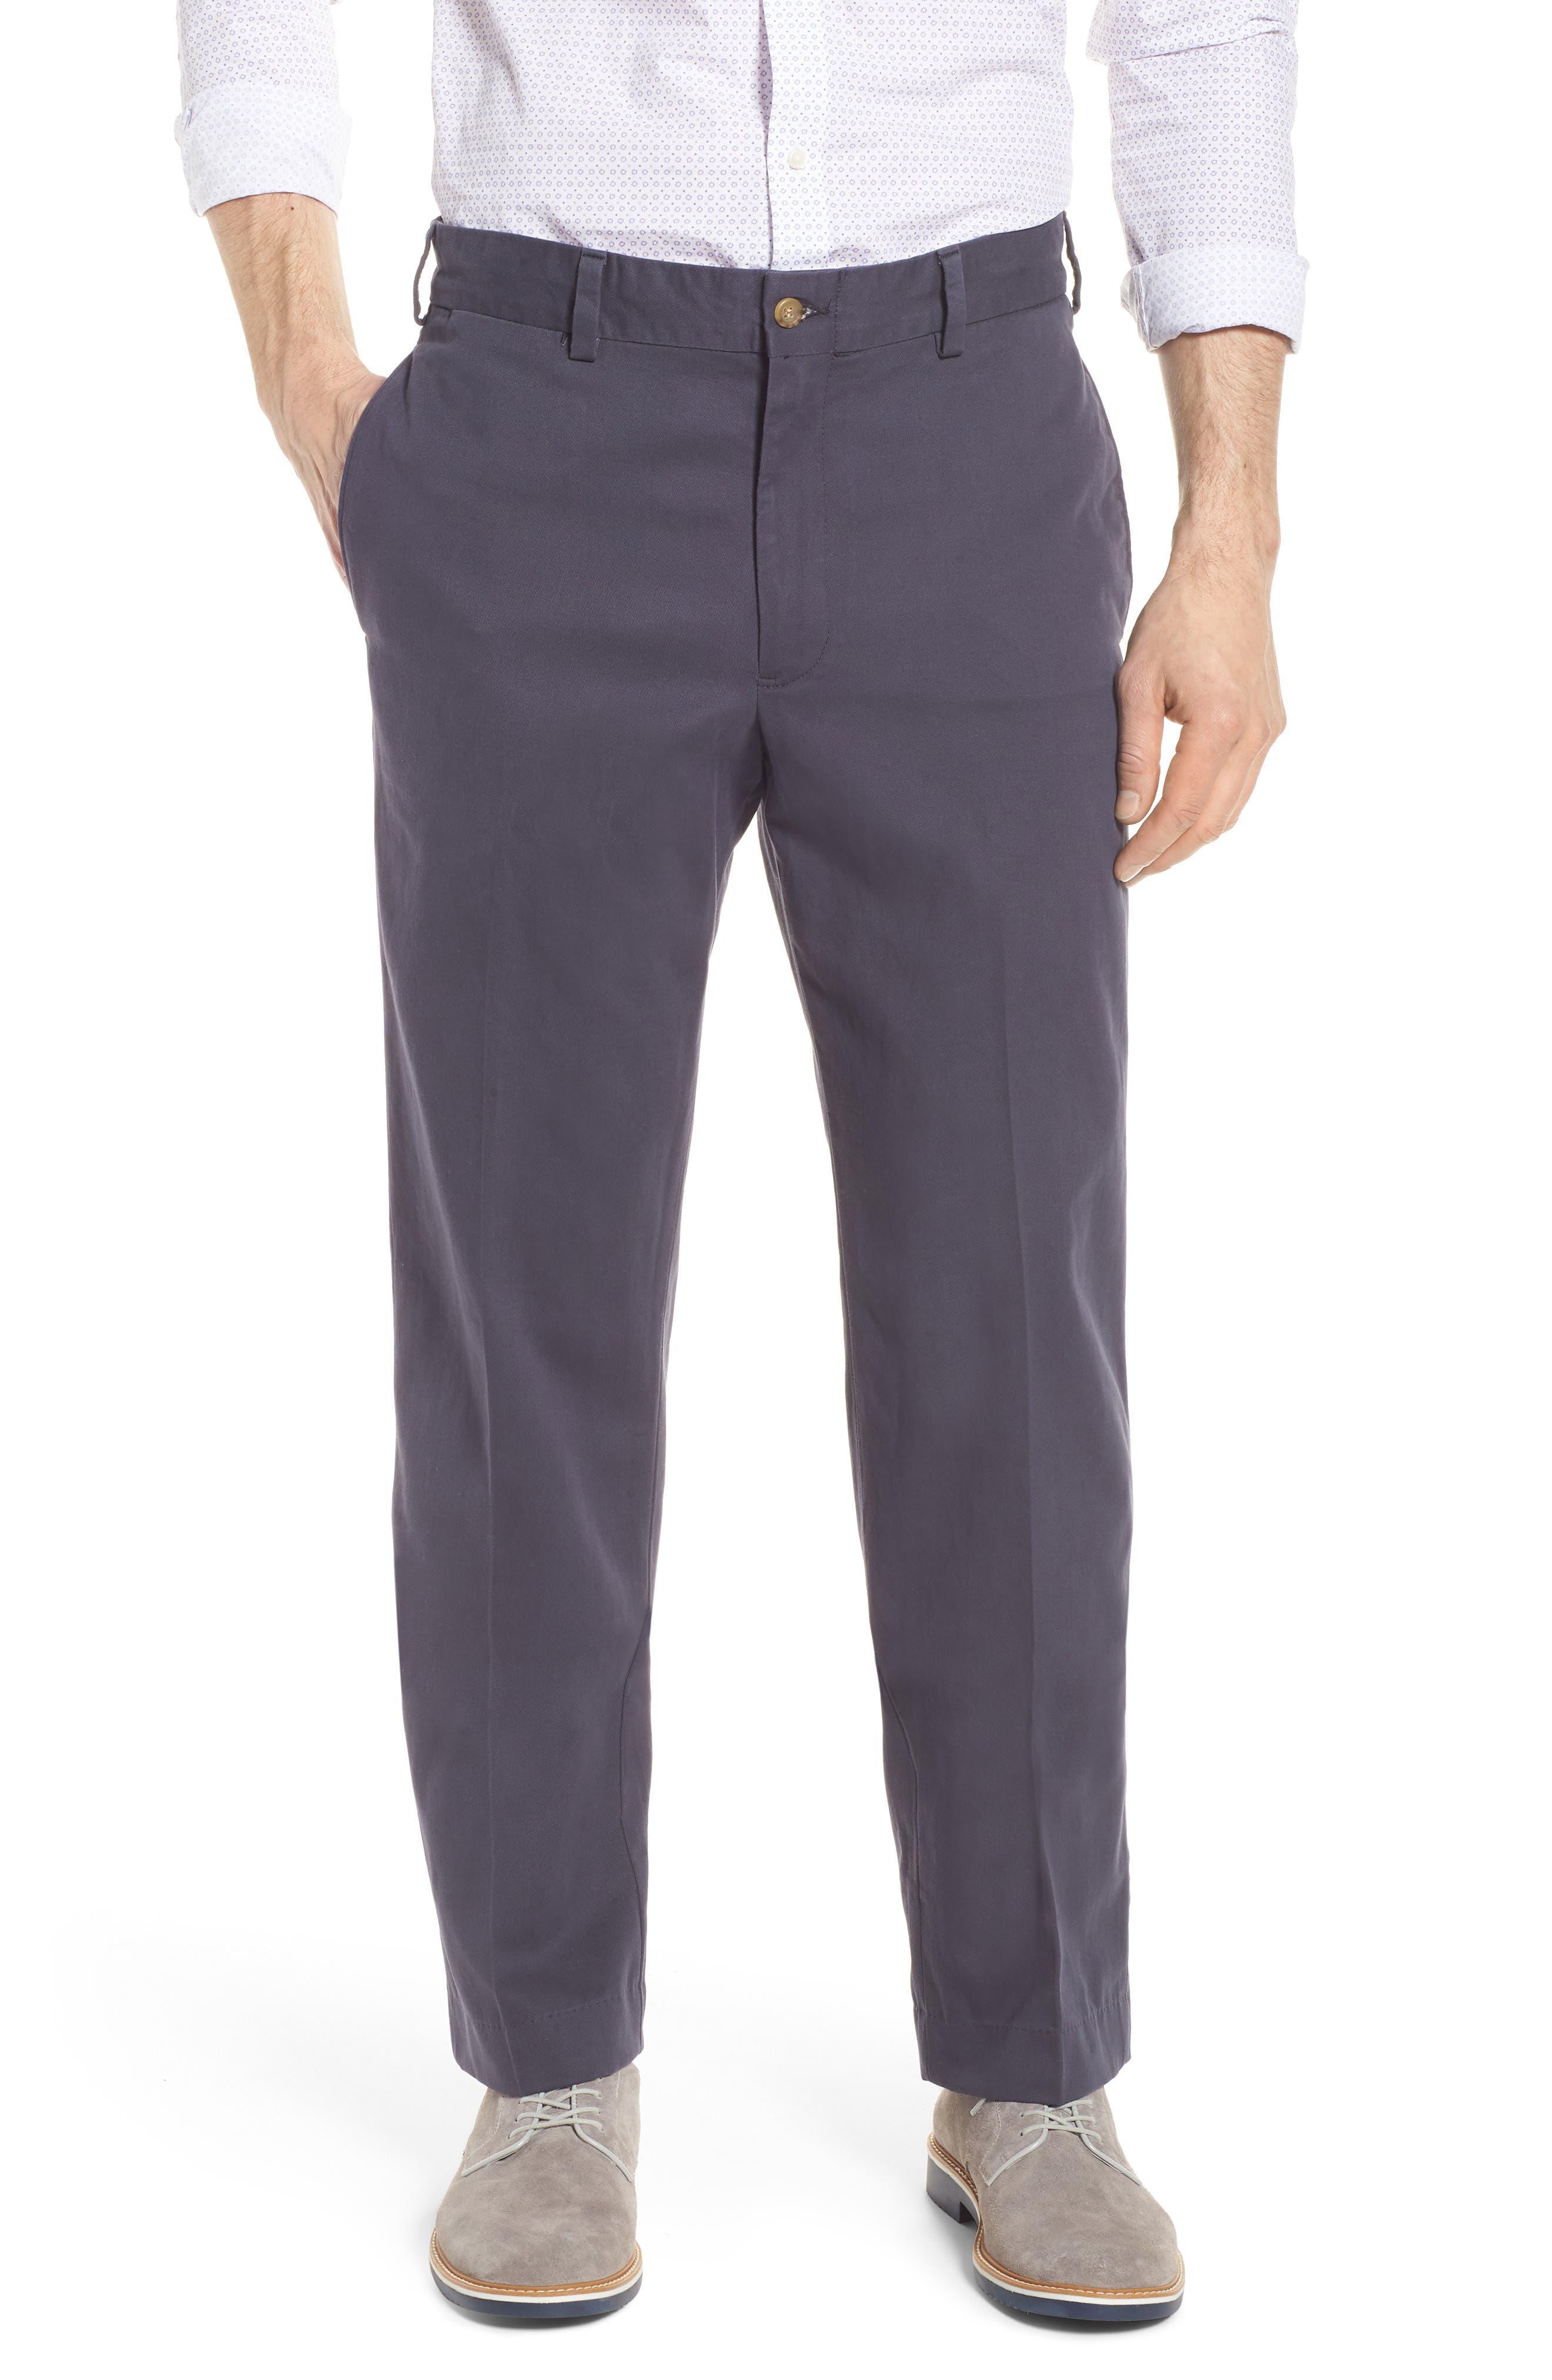 M2 Classic Fit Flat Front Vintage Twill Pants,                             Main thumbnail 1, color,